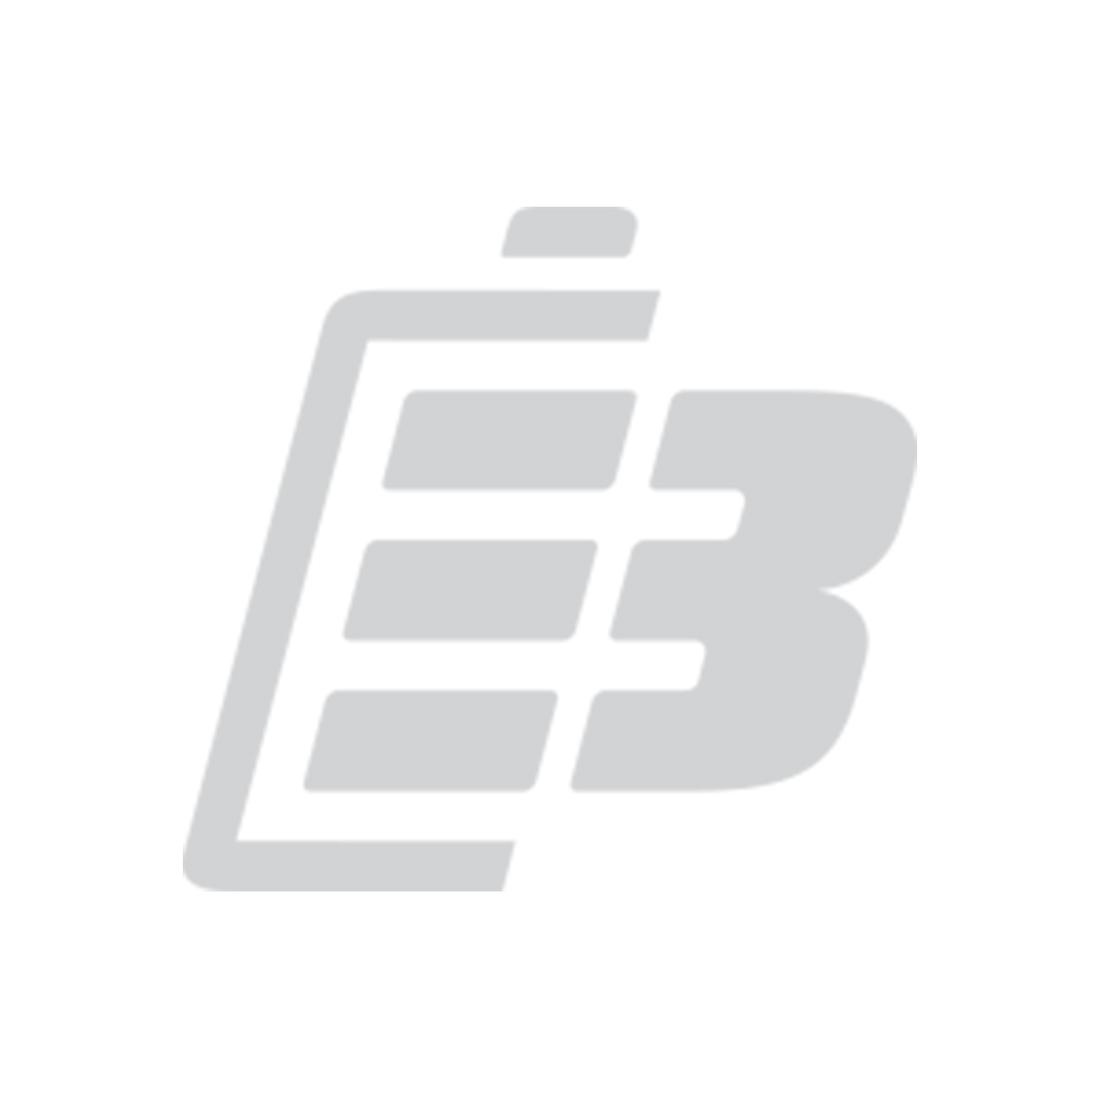 Laptop battery Apple MacBook Pro 15 Retina Late 2013_1